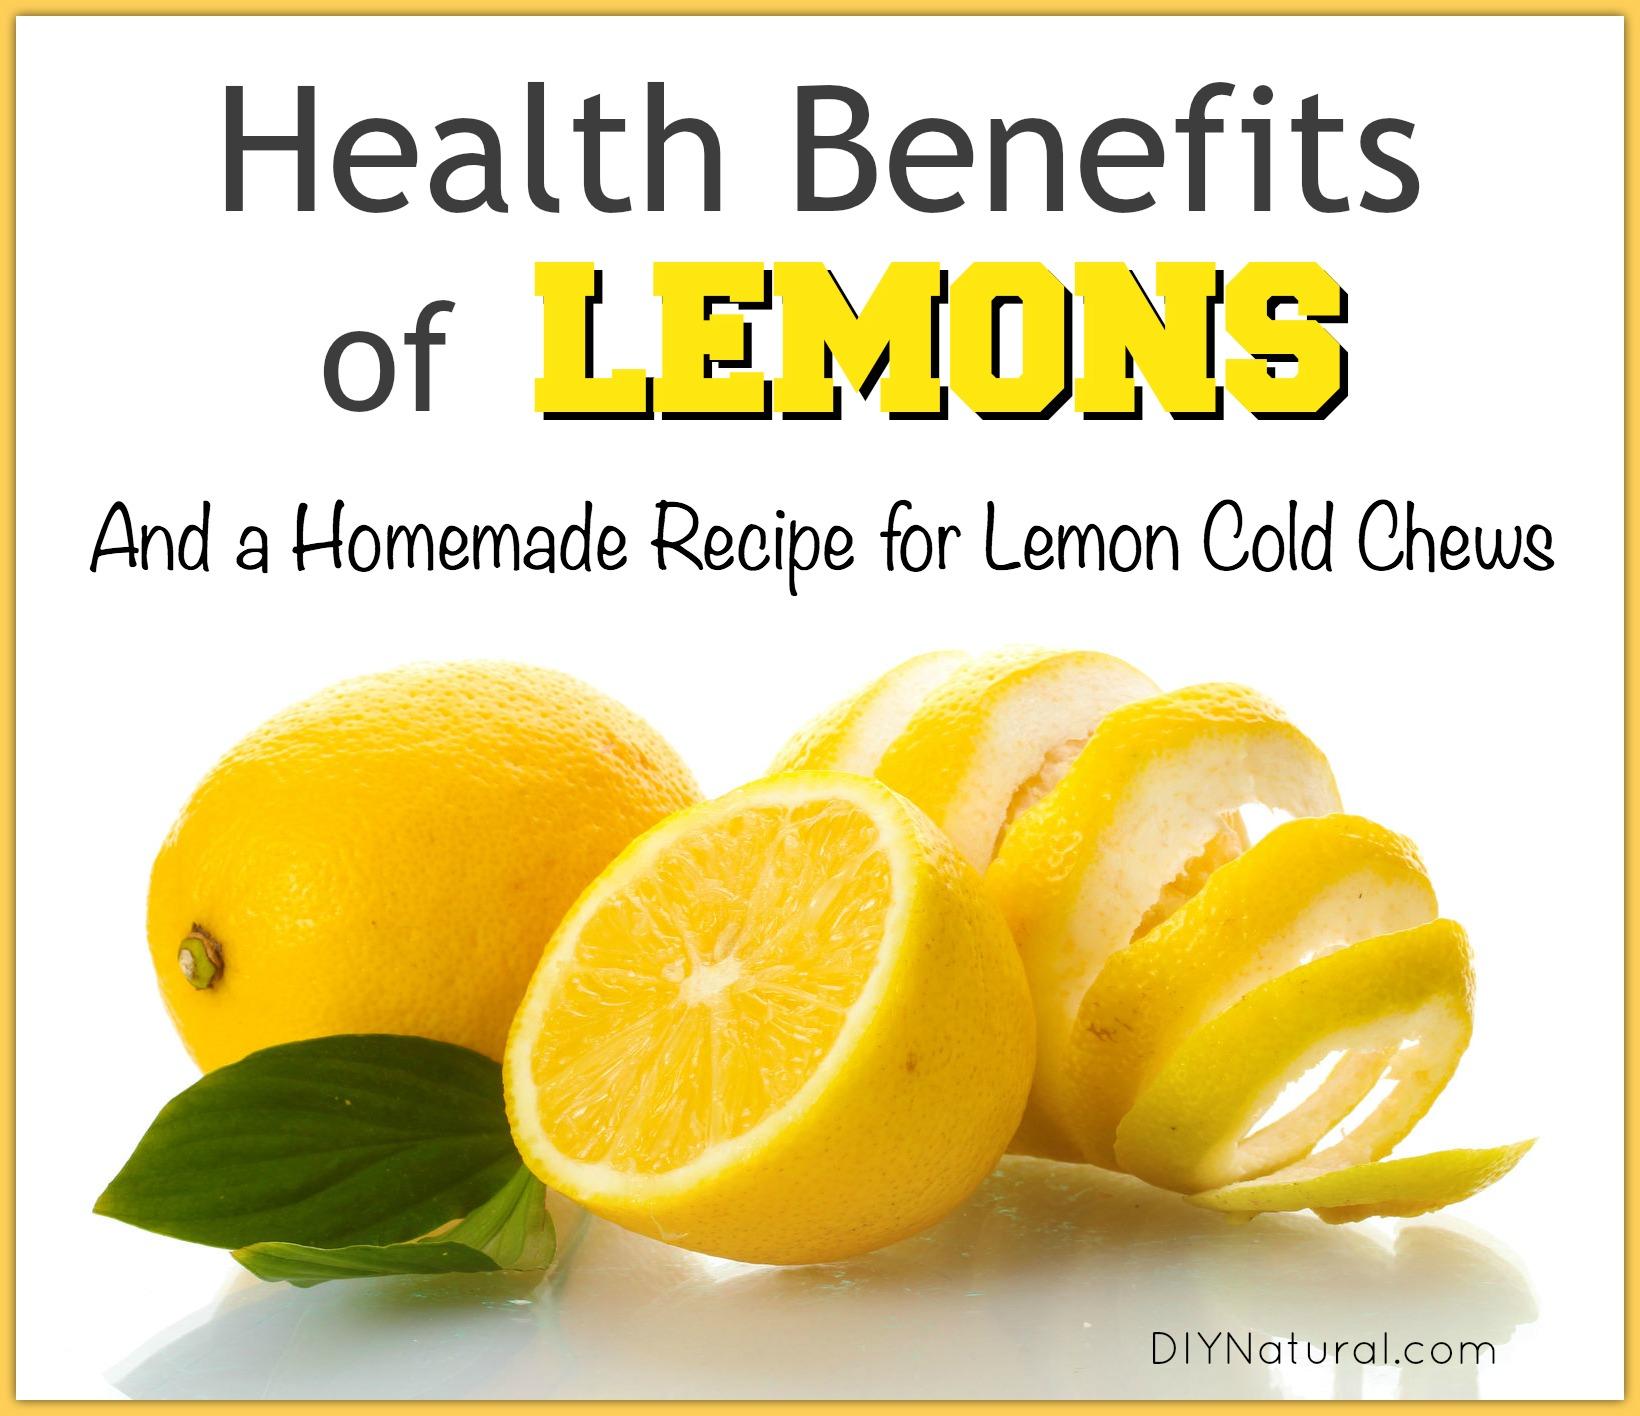 Health-Benefits-of-Lemons.jpg